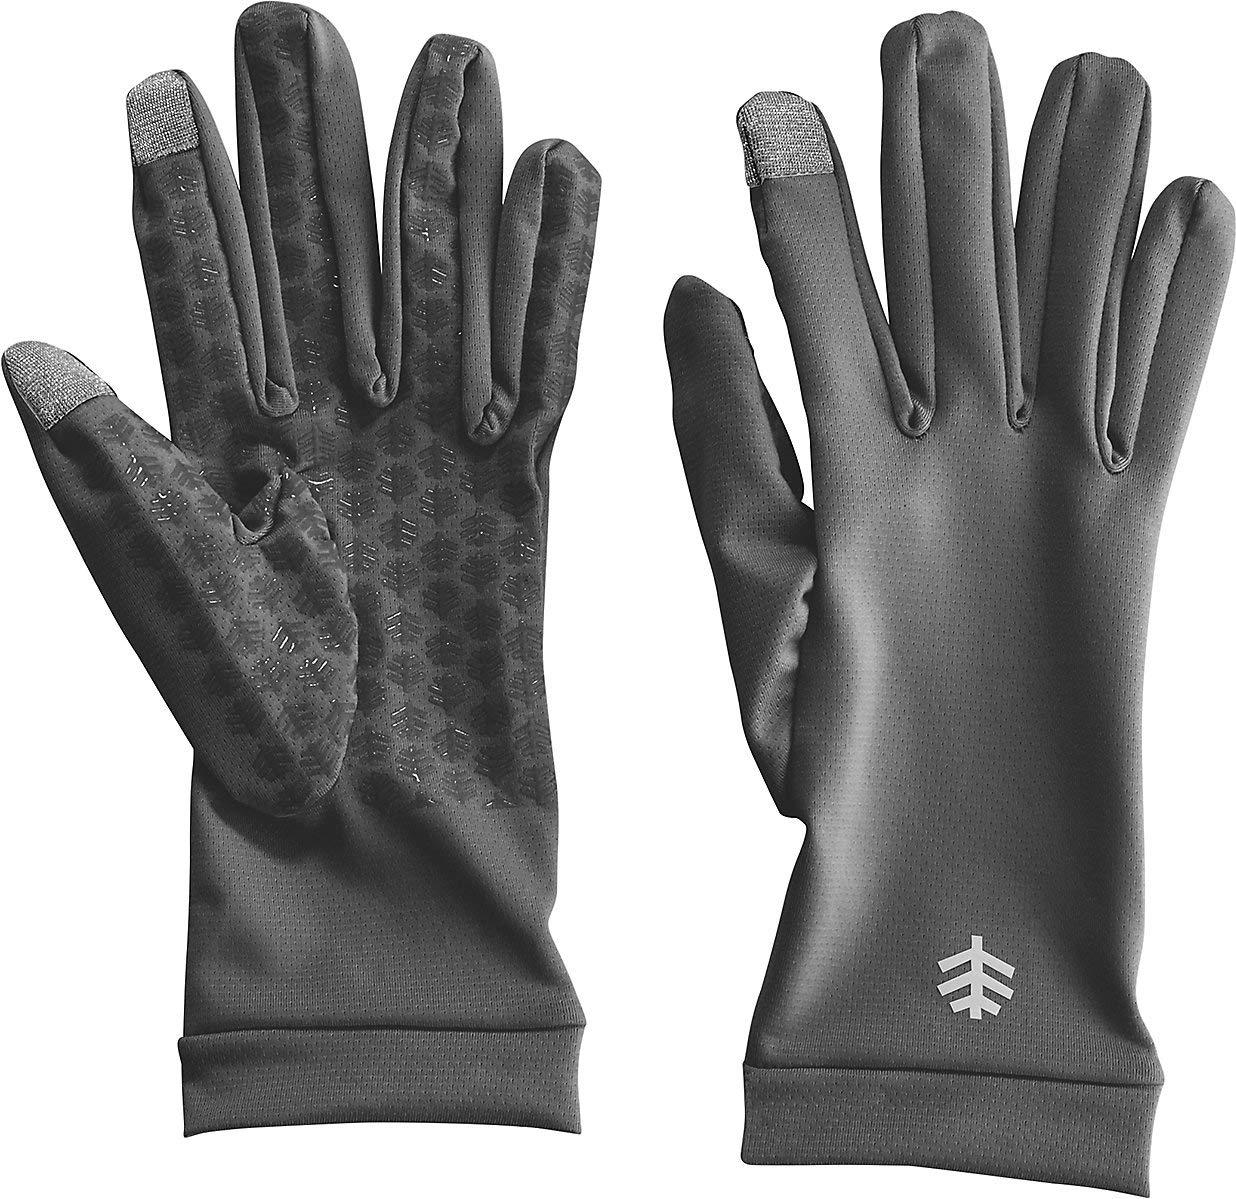 Coolibar UPF 50+ Unisex UV Gloves - Sun Protective (Small- Charcoal)